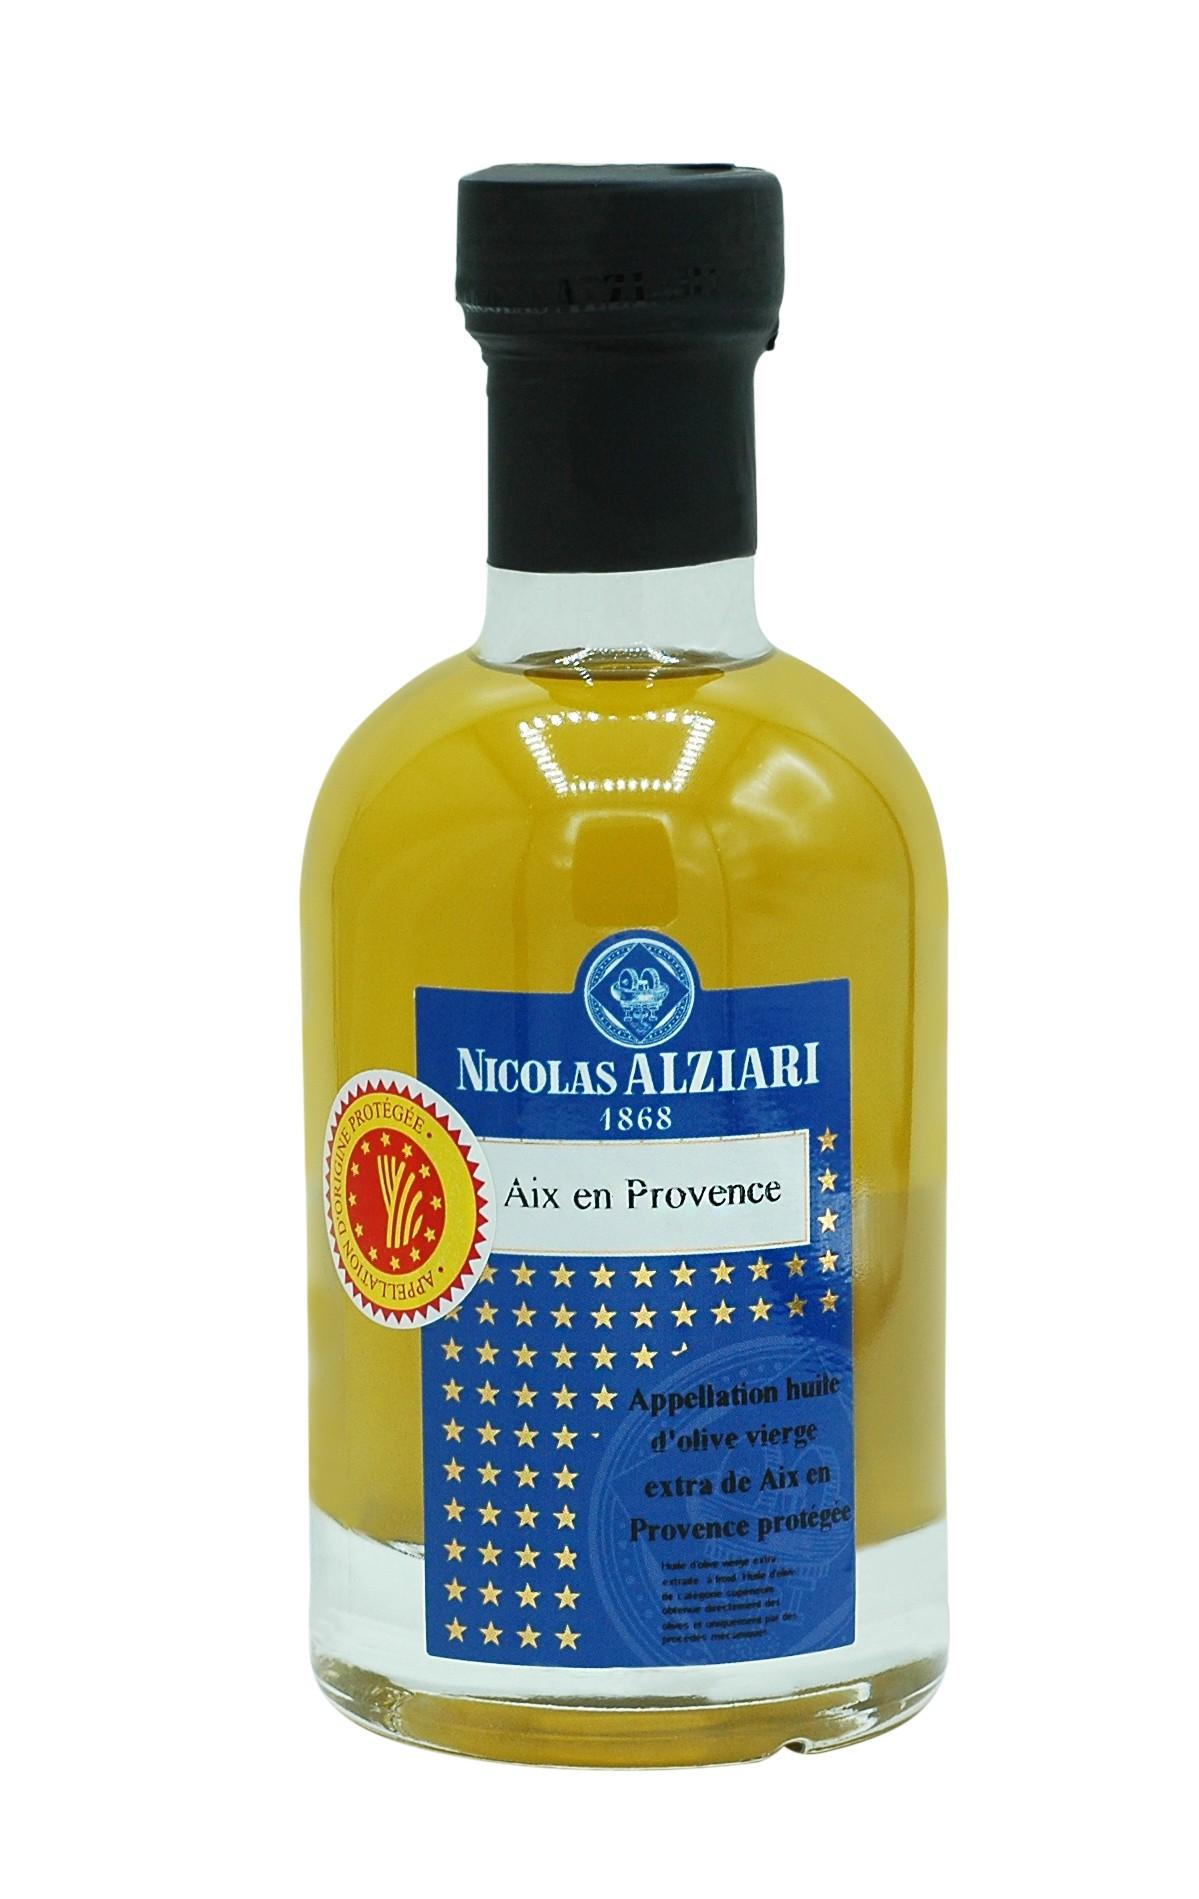 PDO Olive oil Aix en Provence 200 ML (Protected Designation of Origin)